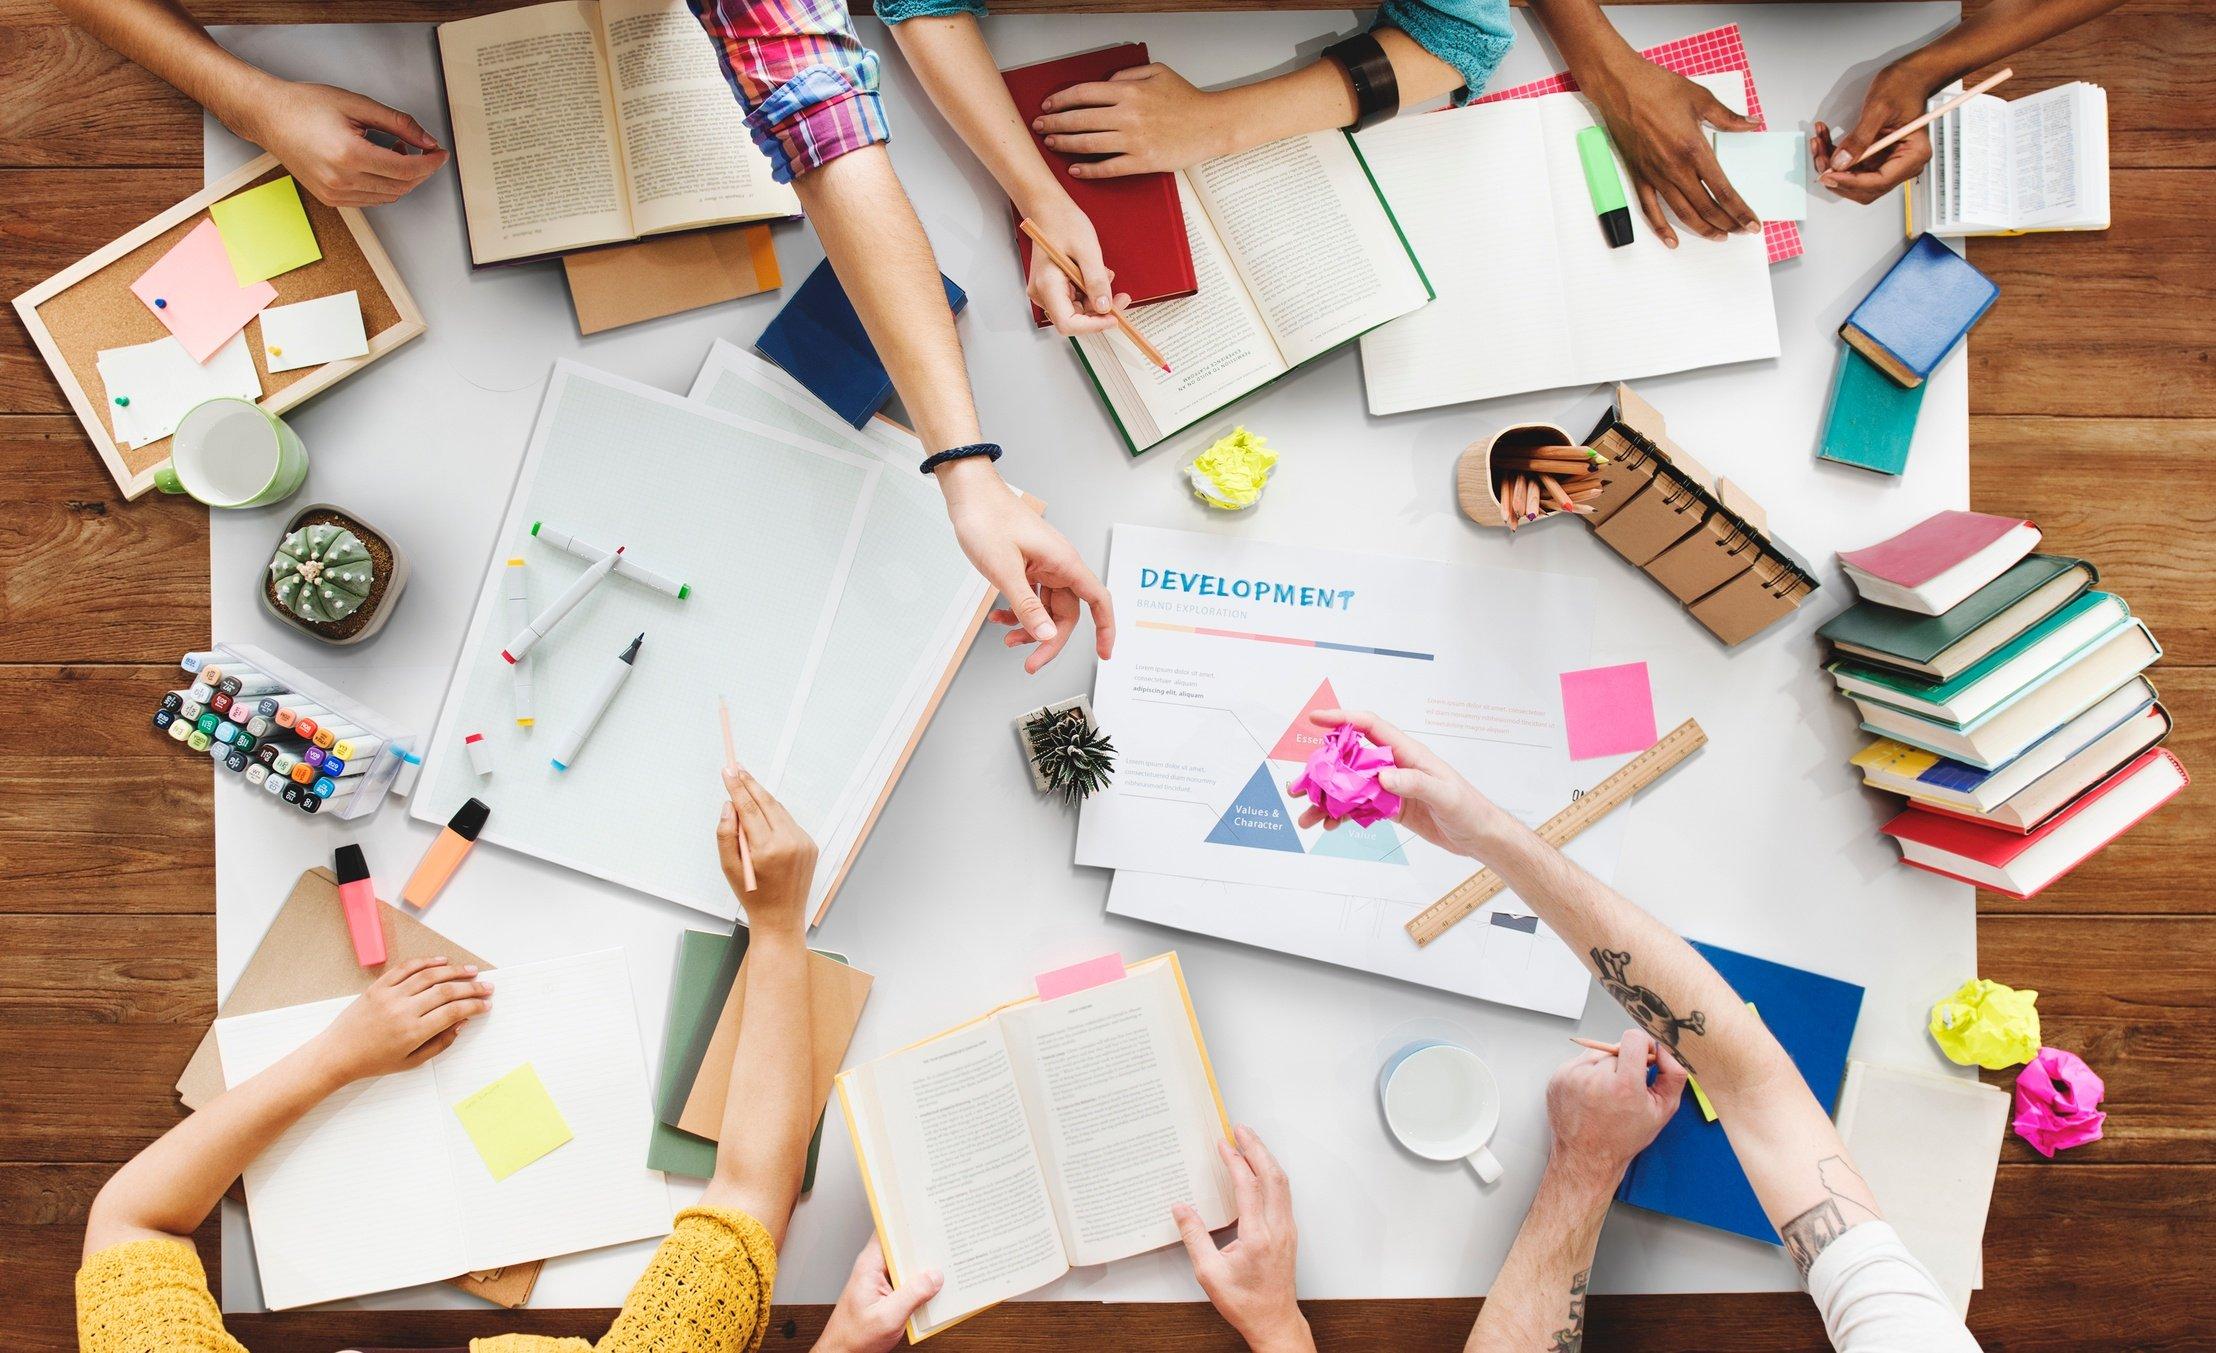 Digital portfolios via a learning management system help students stay organized.